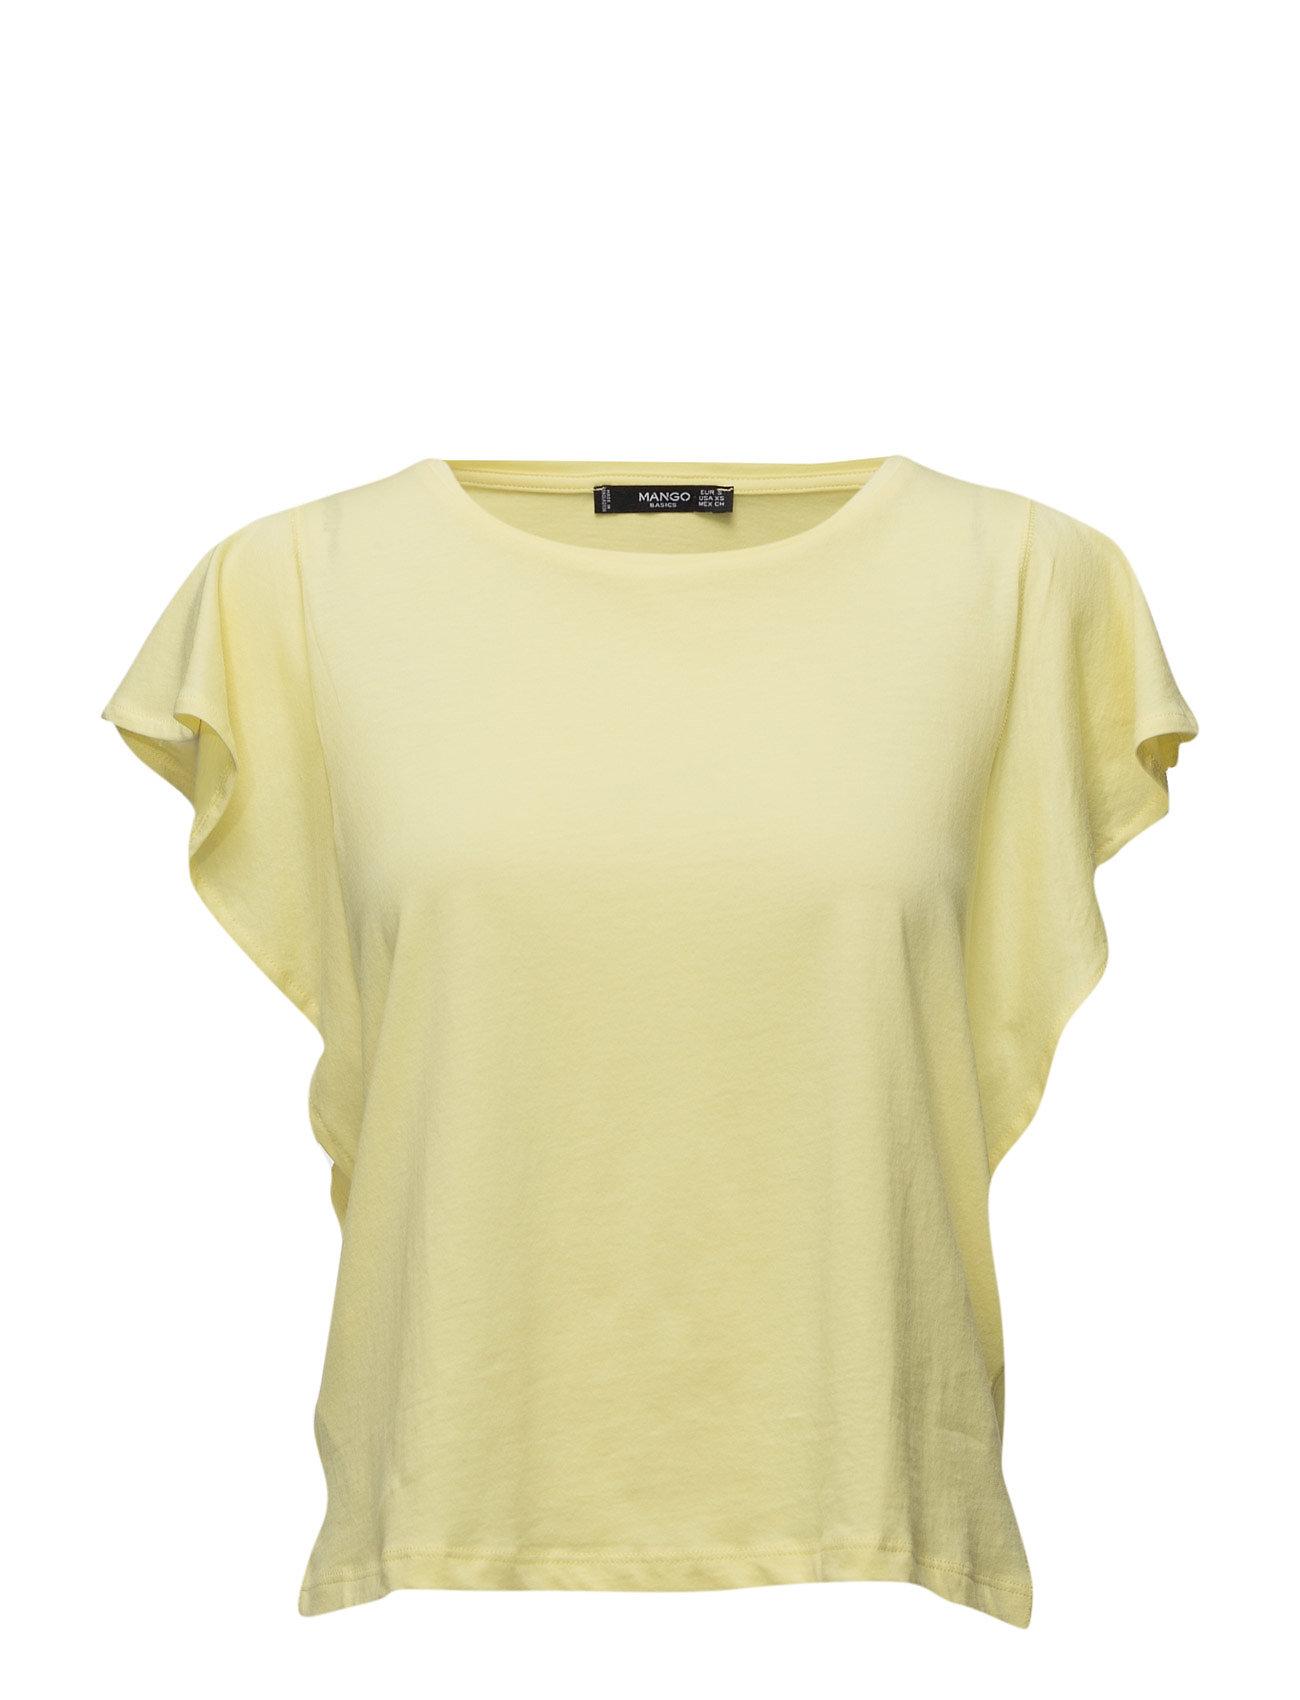 Ruffled Sleeve T-Shirt Mango Kortærmede til Damer i Gul